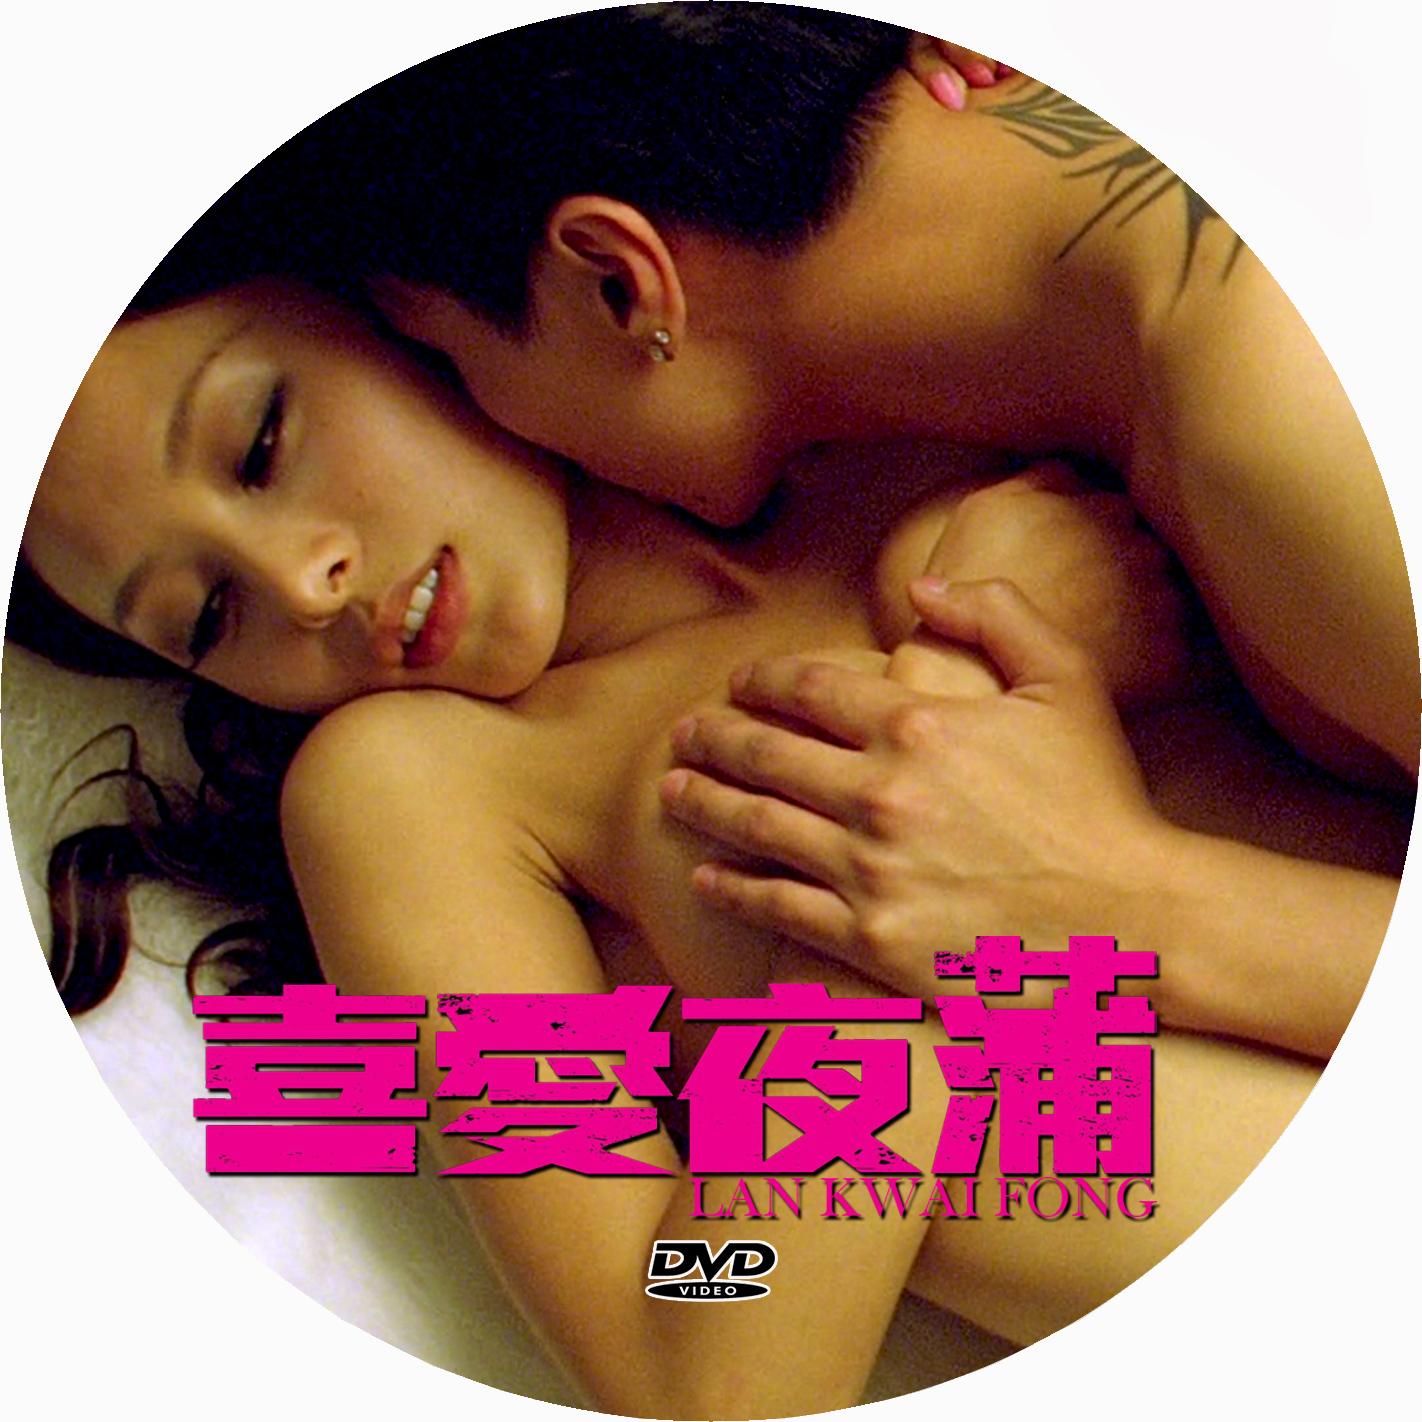 Lan kwai fong 2 (2012) bluray 720p & 1080p wellows.